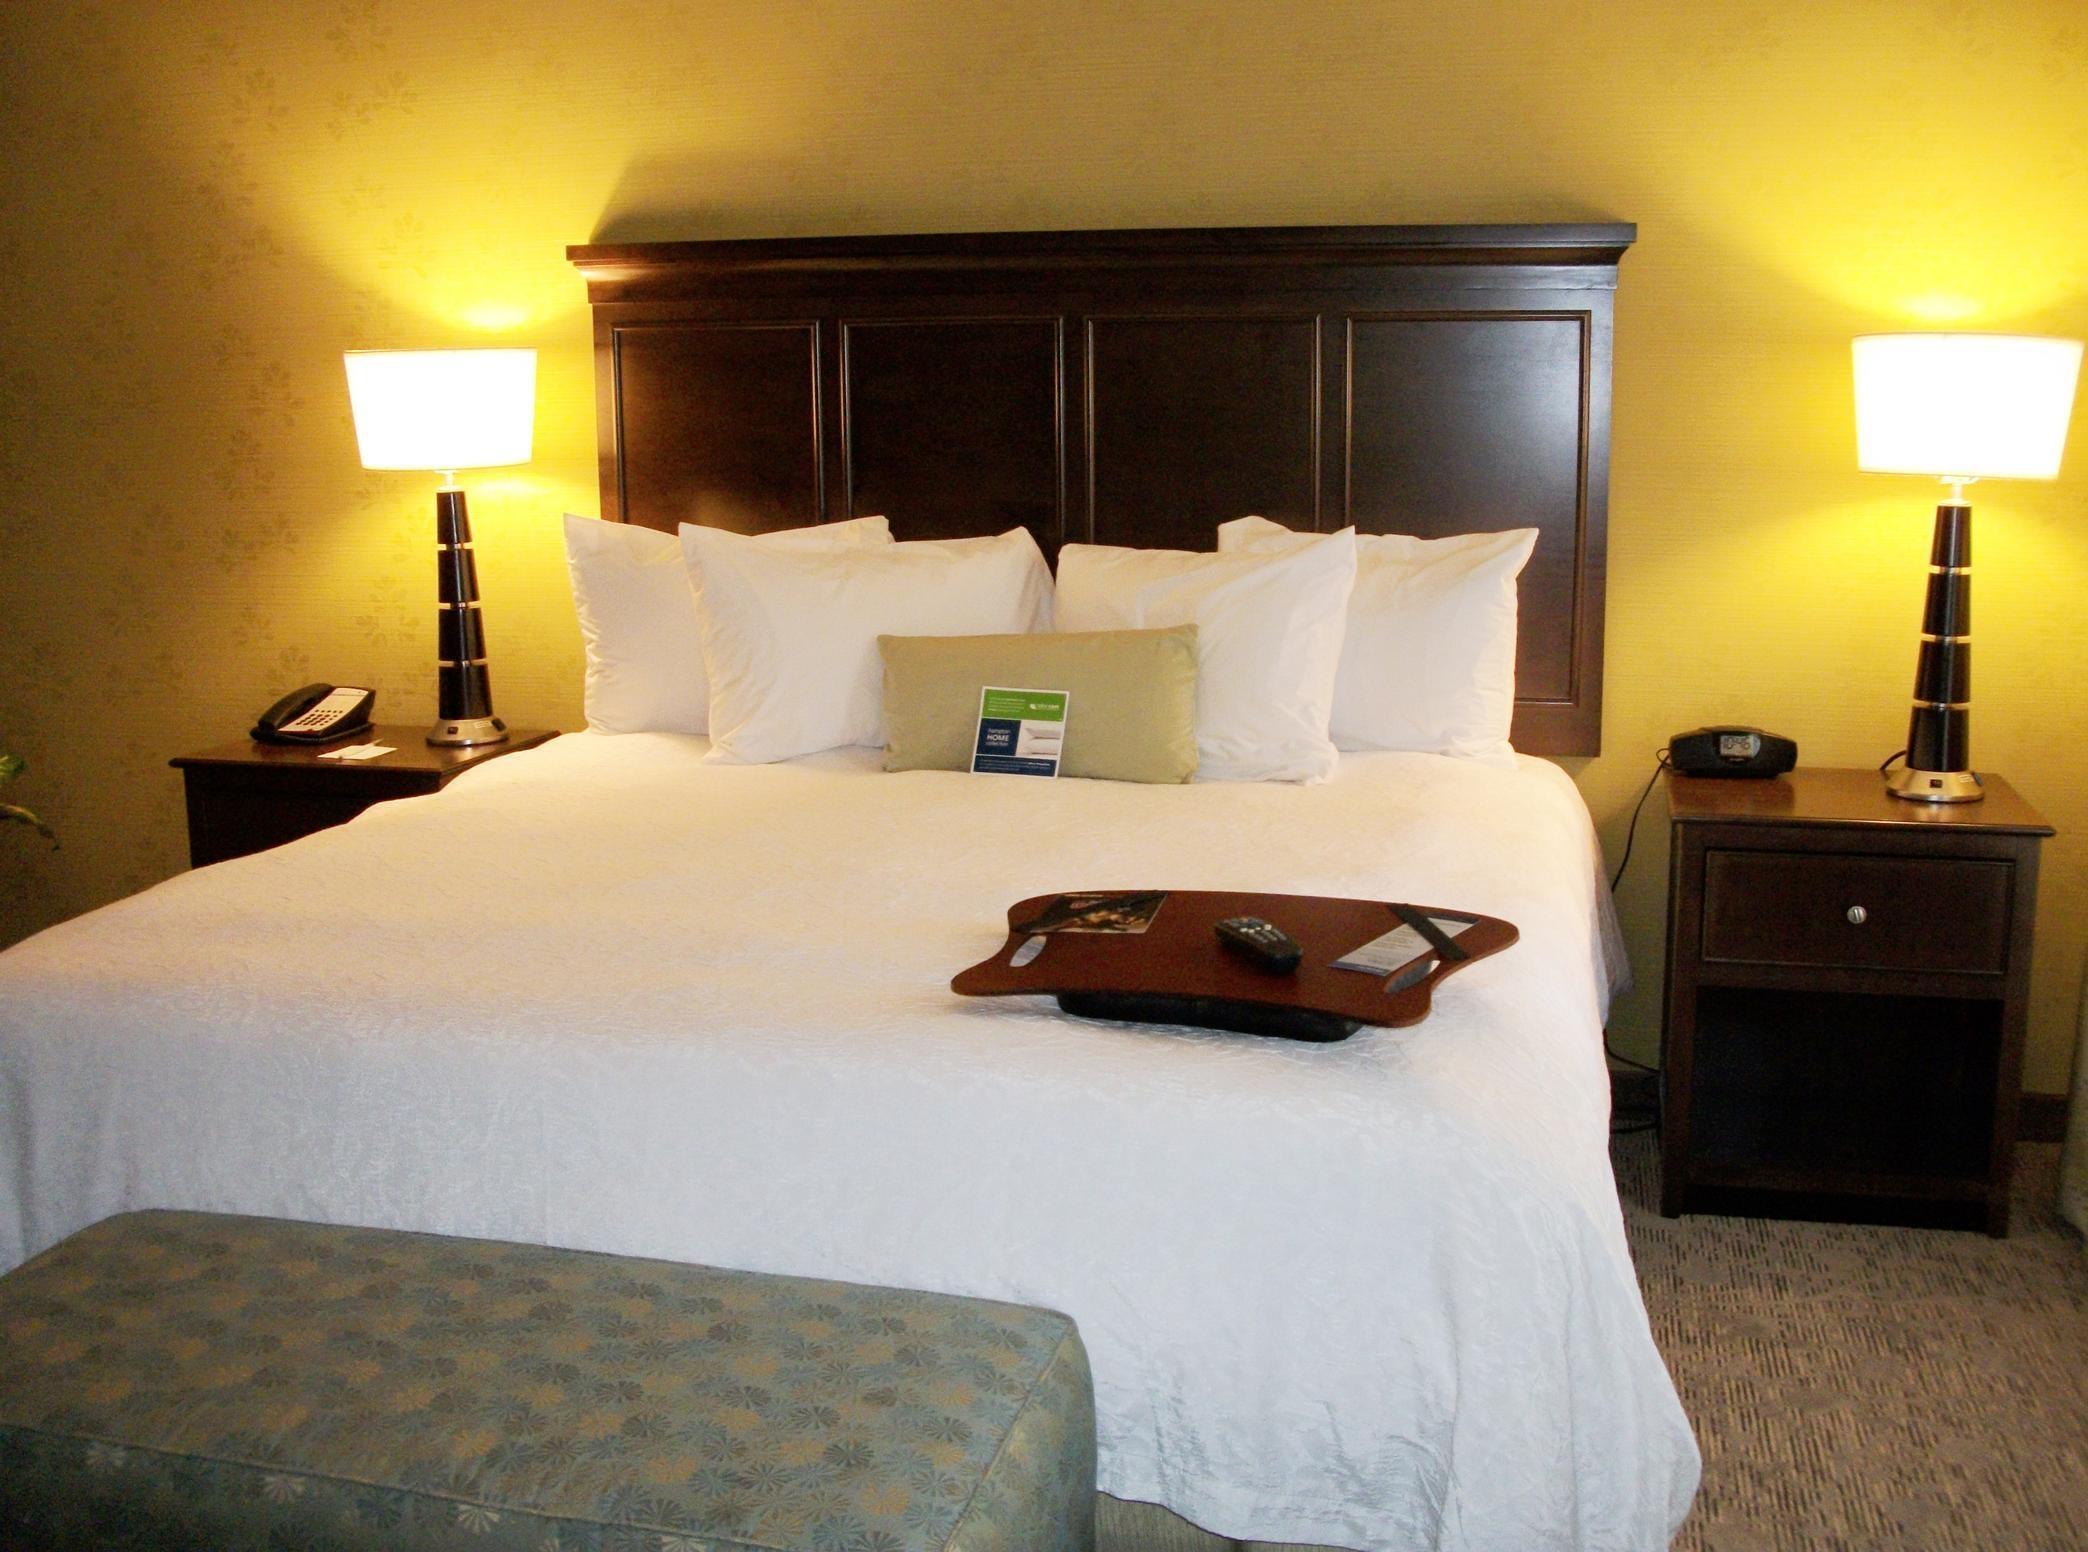 Hampton Inn & Suites Manteca image 22